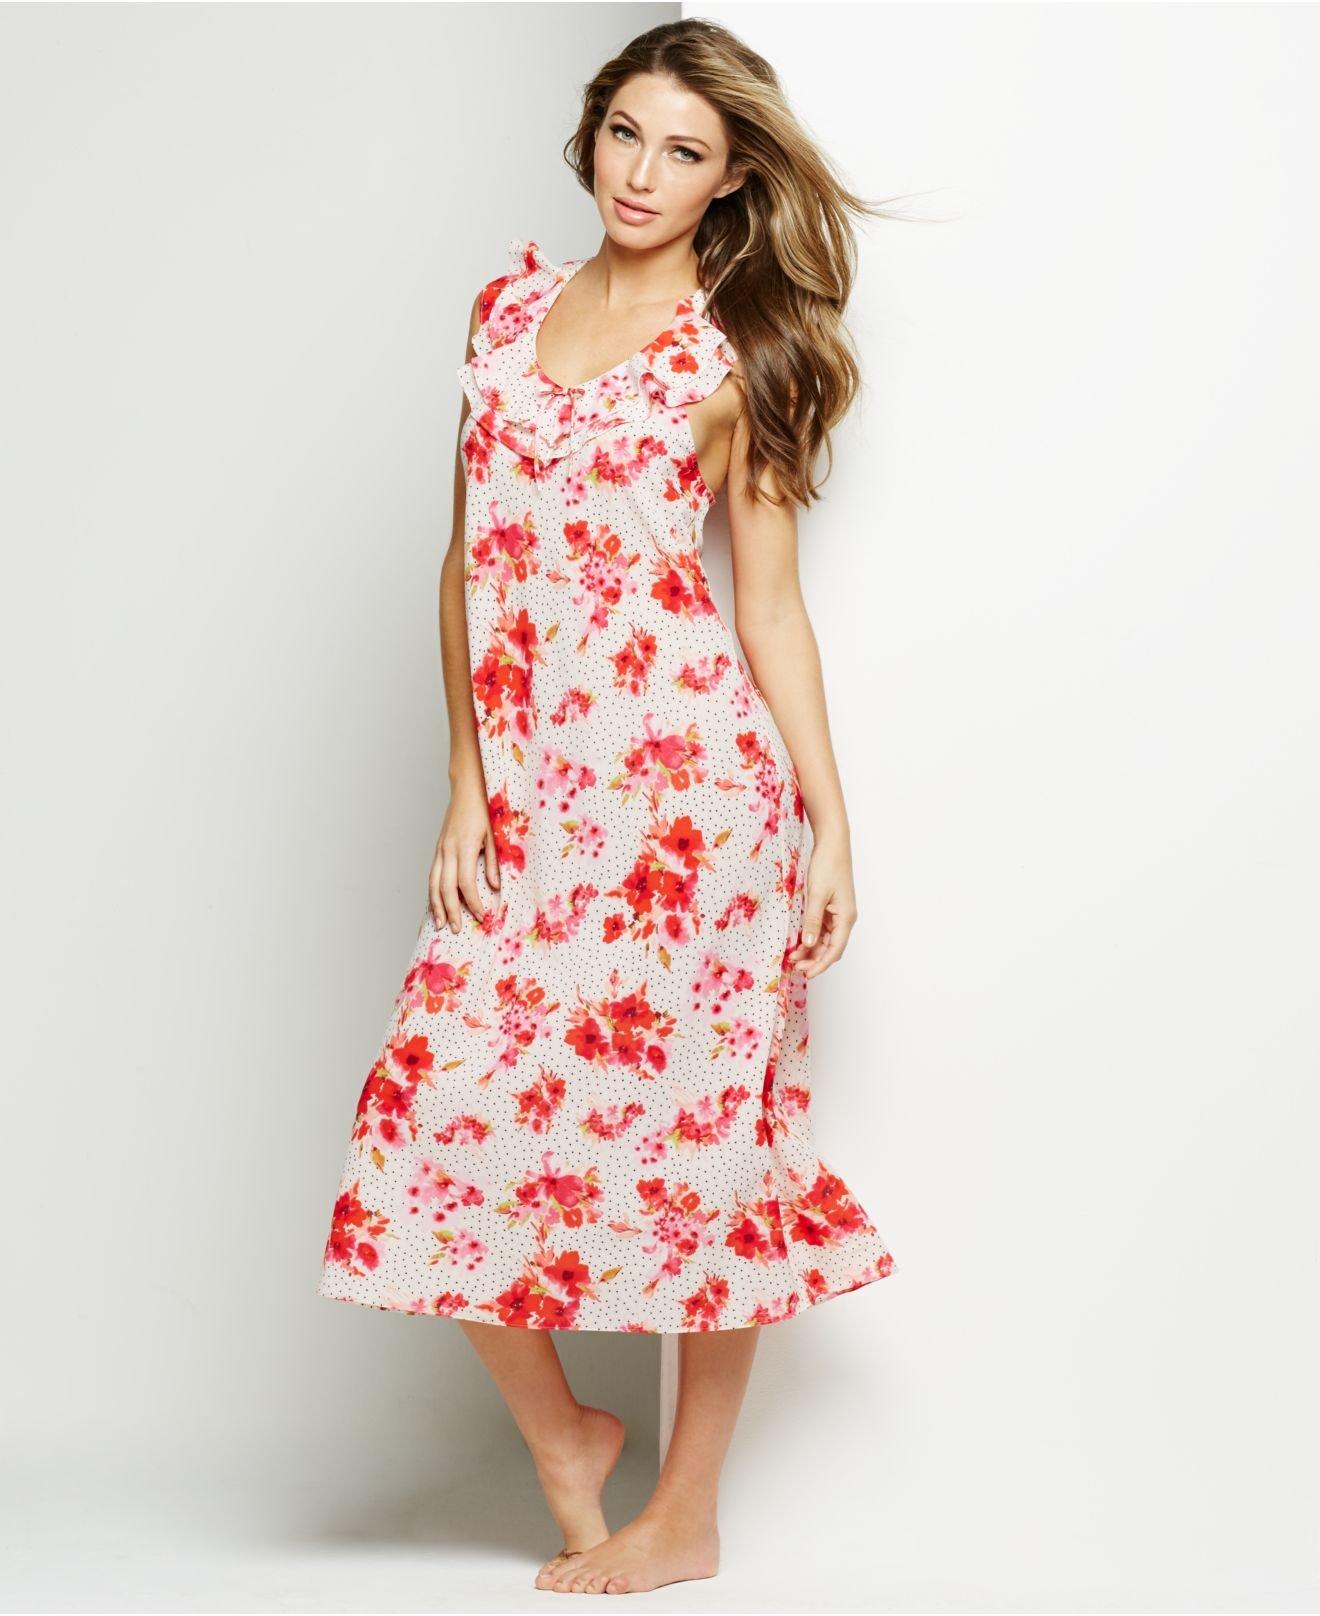 Lyst - Oscar de la Renta Pink Label Floral Ruffle Long Nightgown in ... 652cbb302